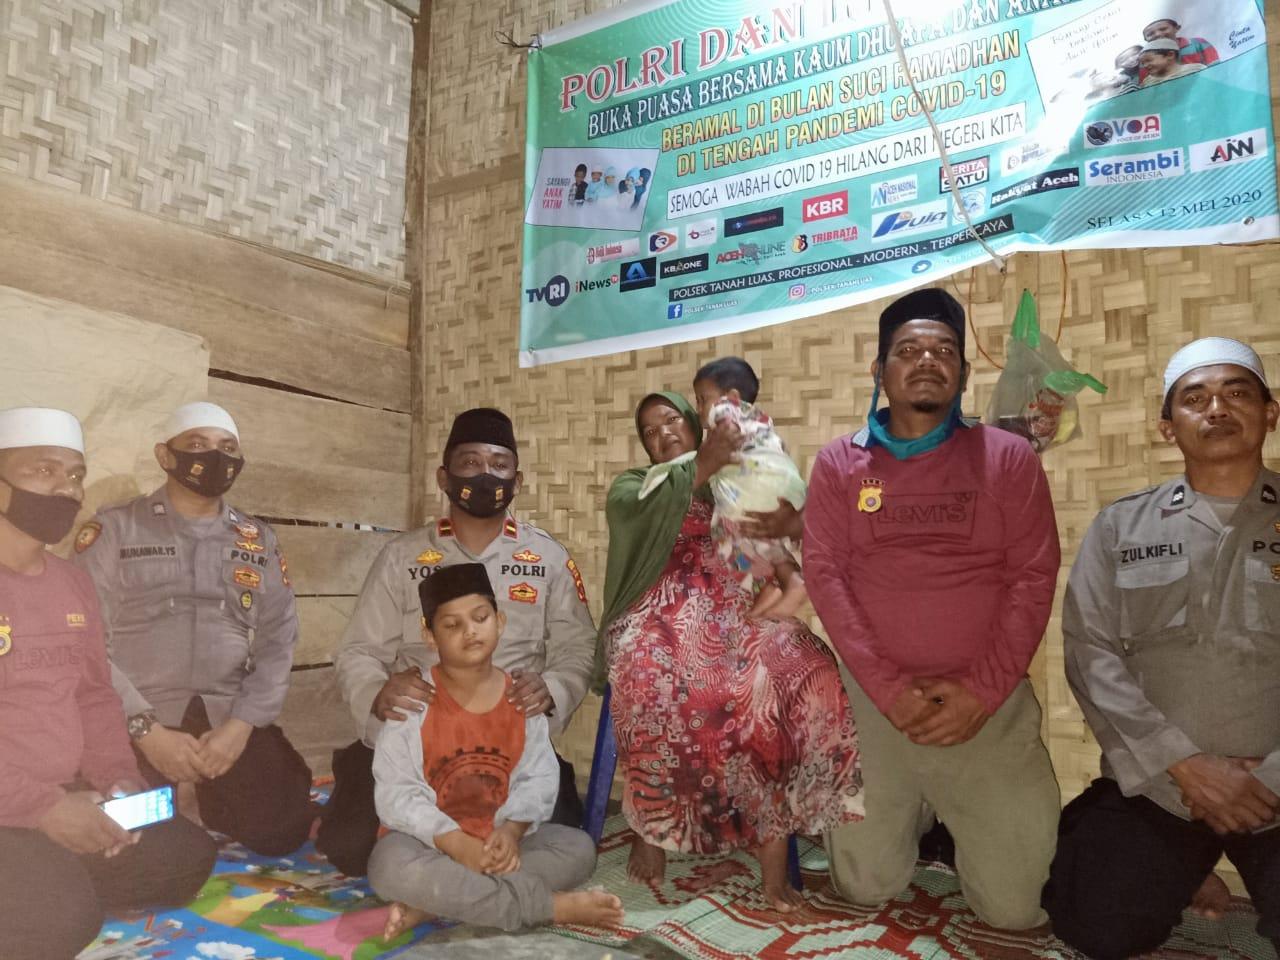 Video : Polri dan Insan Pers Buka Puasa Barsama Dhuafa dan Anak Yatim